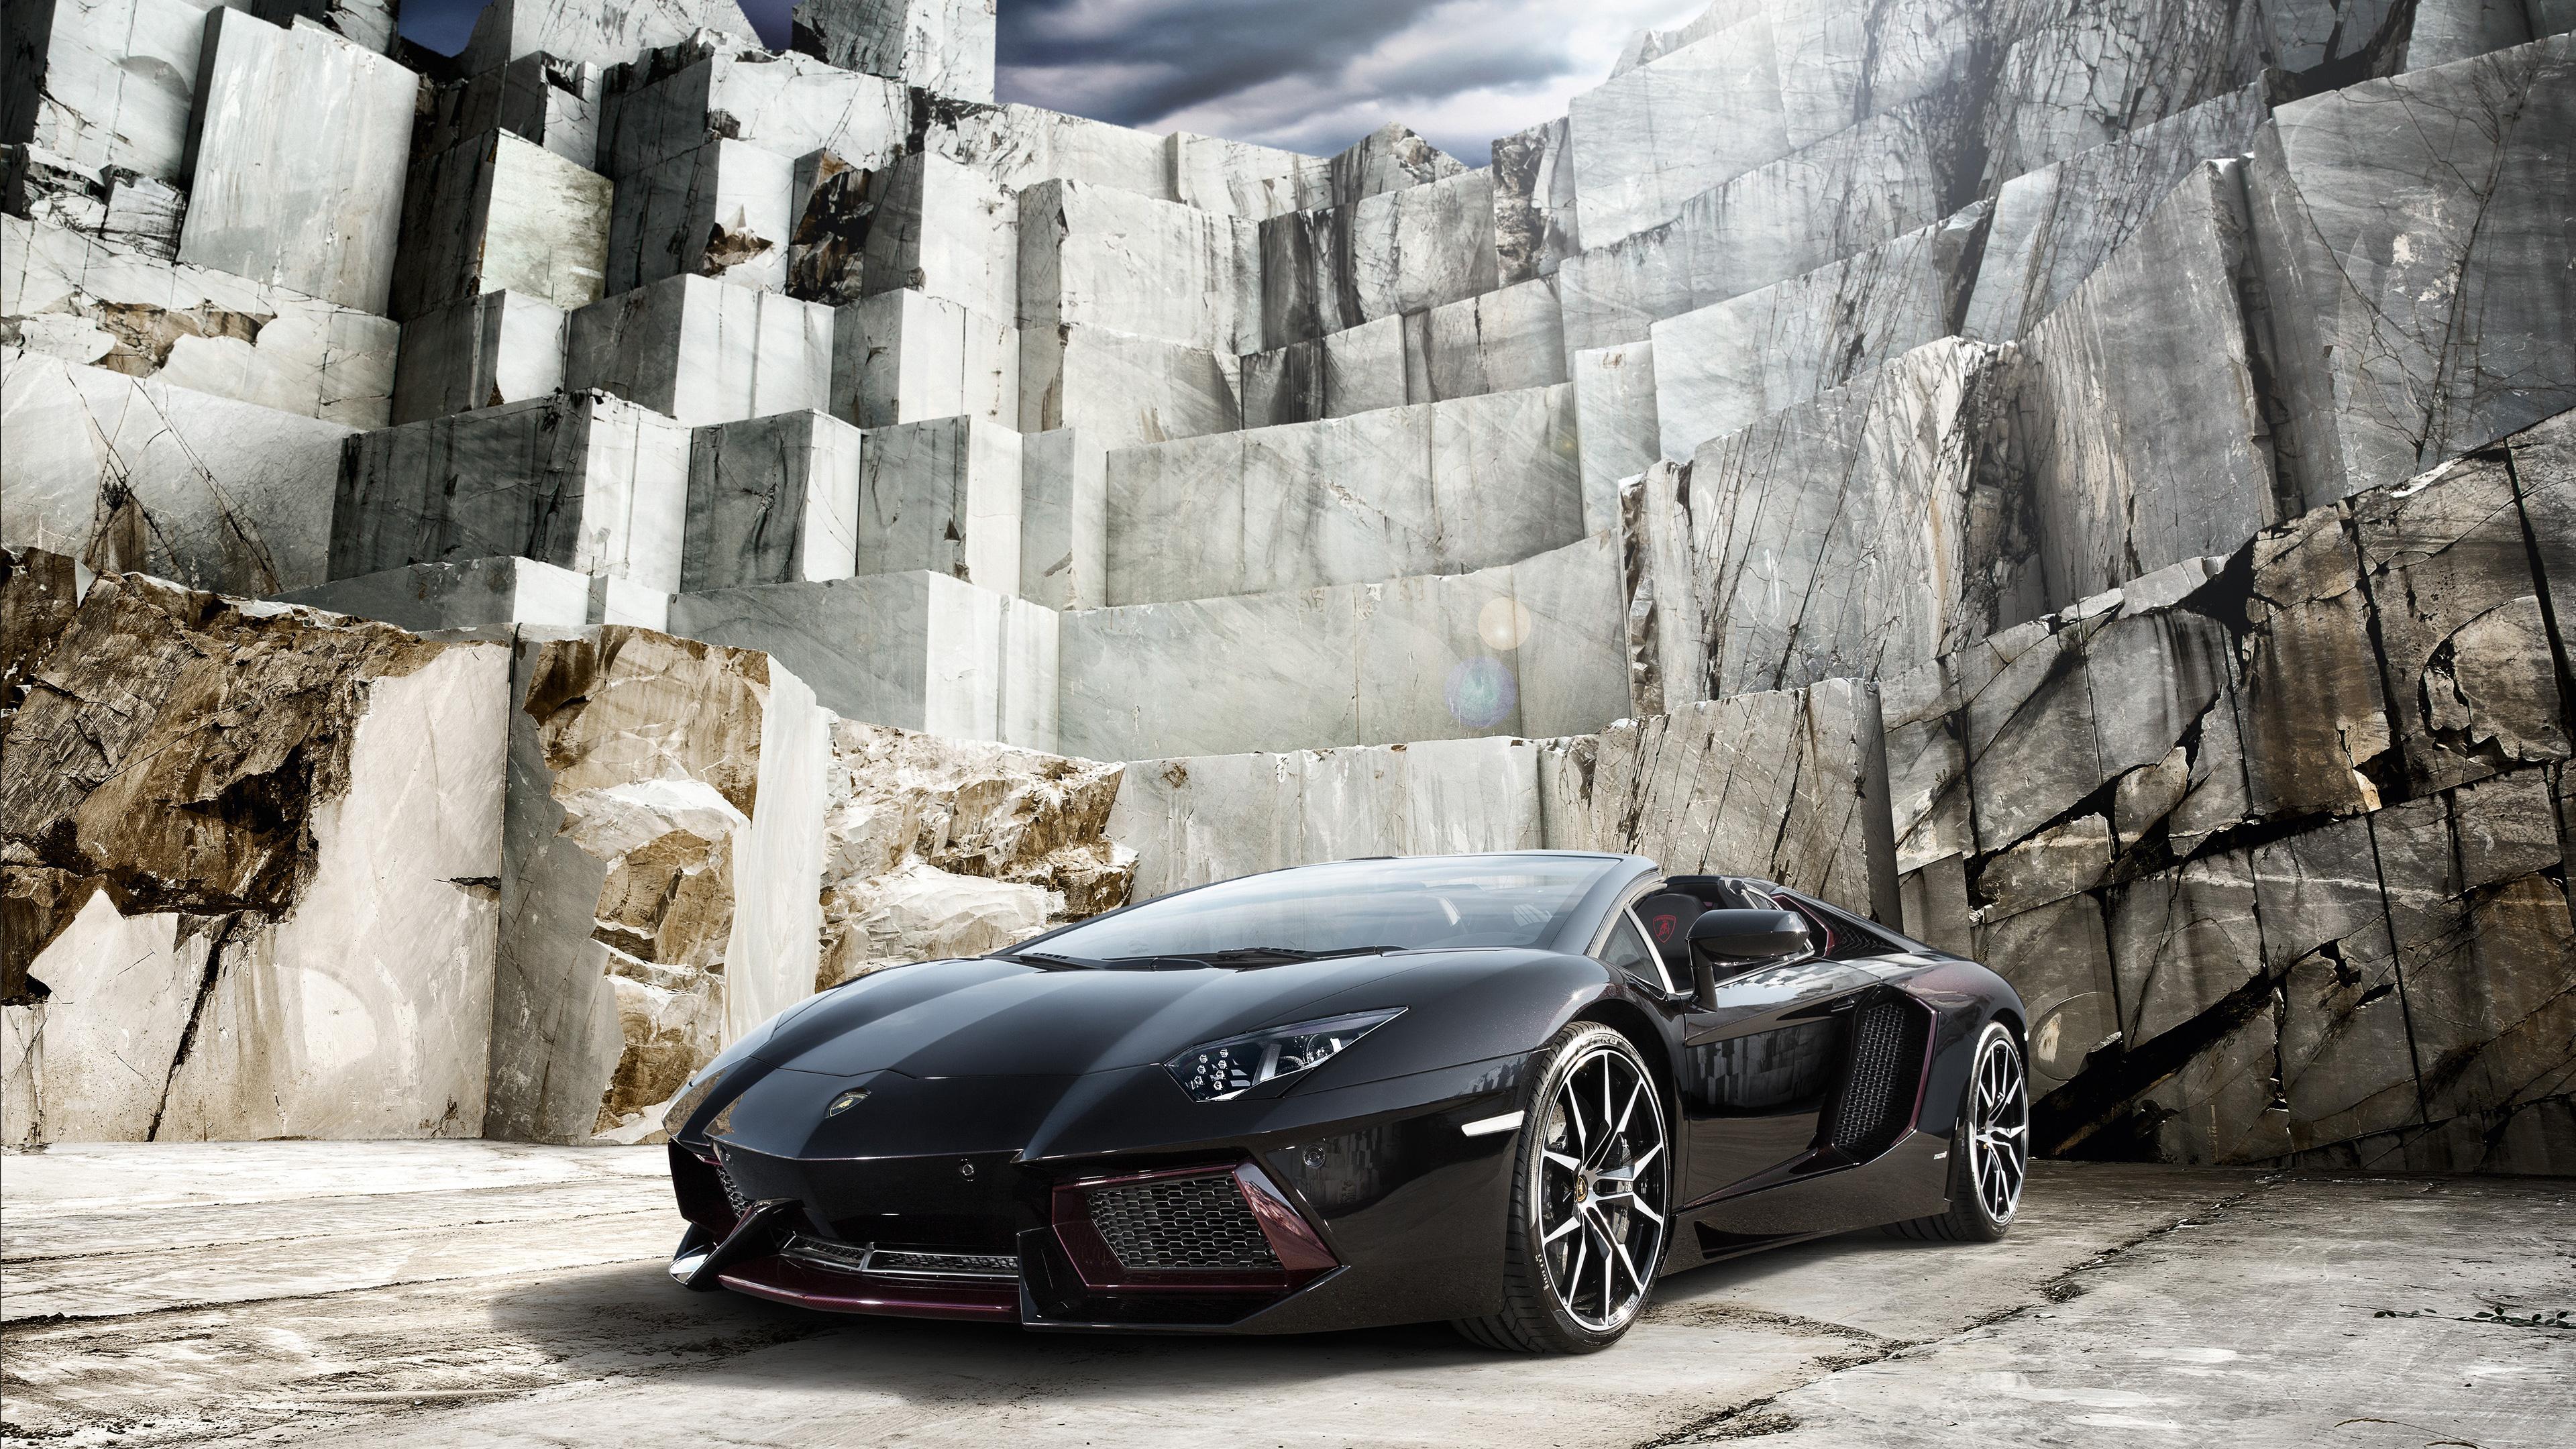 Black Lamborghini Aventador 4k, HD Cars, 4k Wallpapers ...